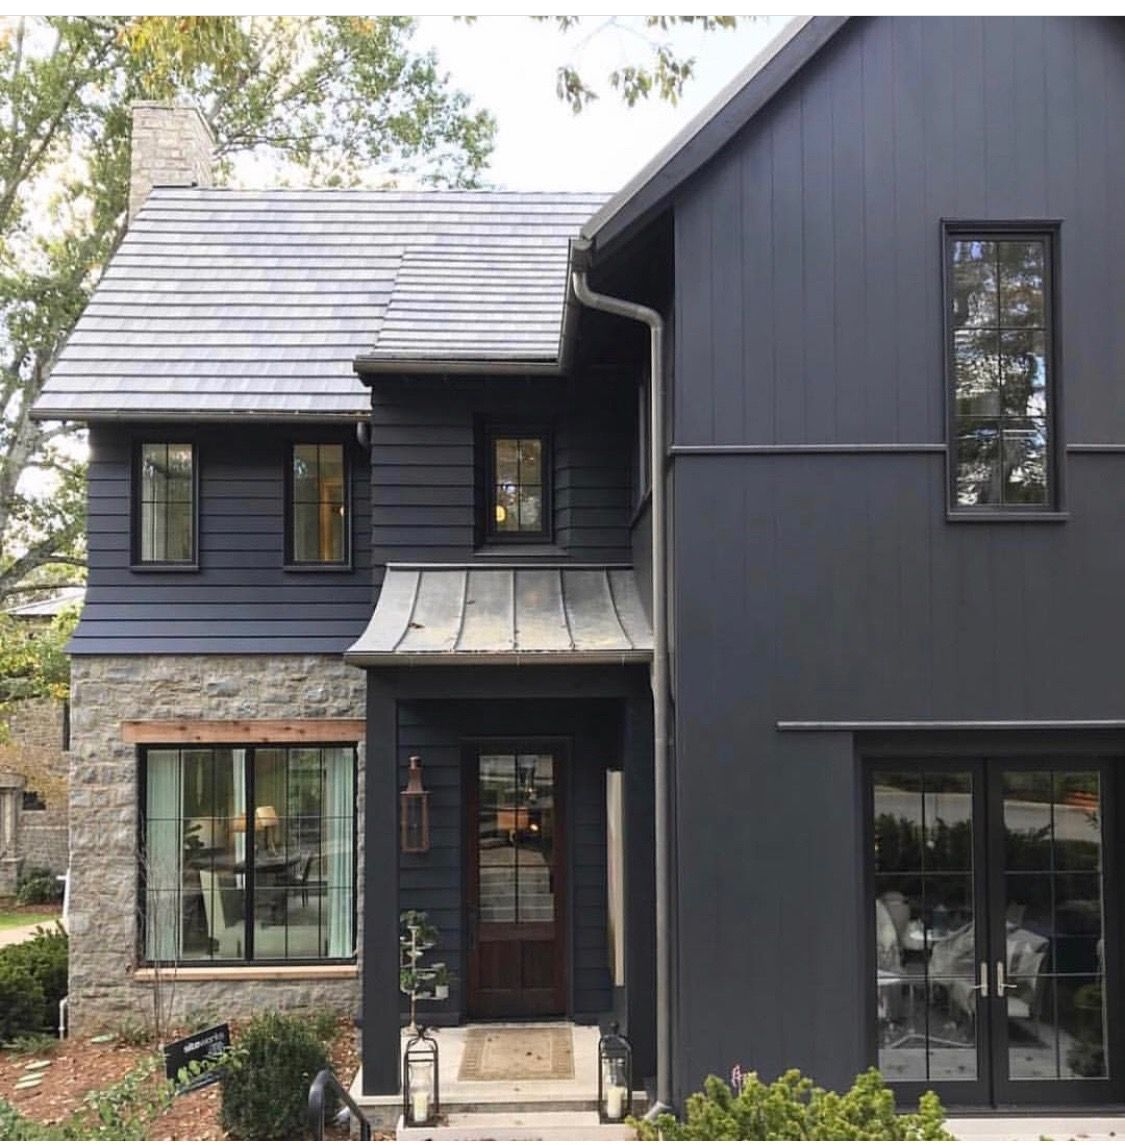 Pin By Courtney Culbertson On Home Design Modern Farmhouse Exterior Black House Exterior House Exterior